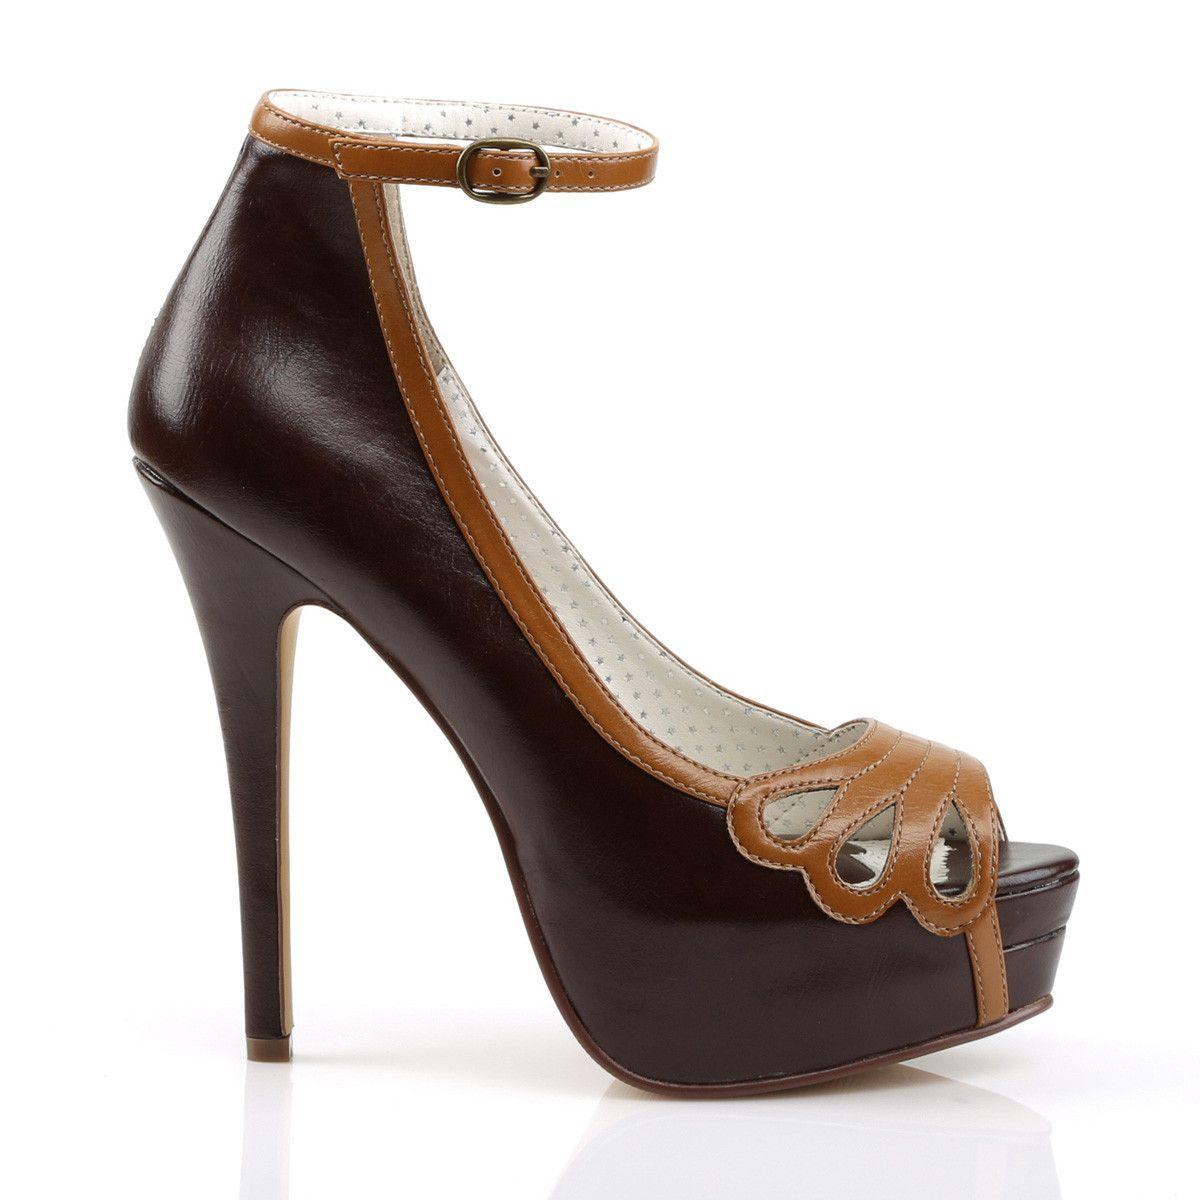 0dec5fddad7c Pin Up Couture BELLA-31 Dark Brown Peep Toe Pump in 2019